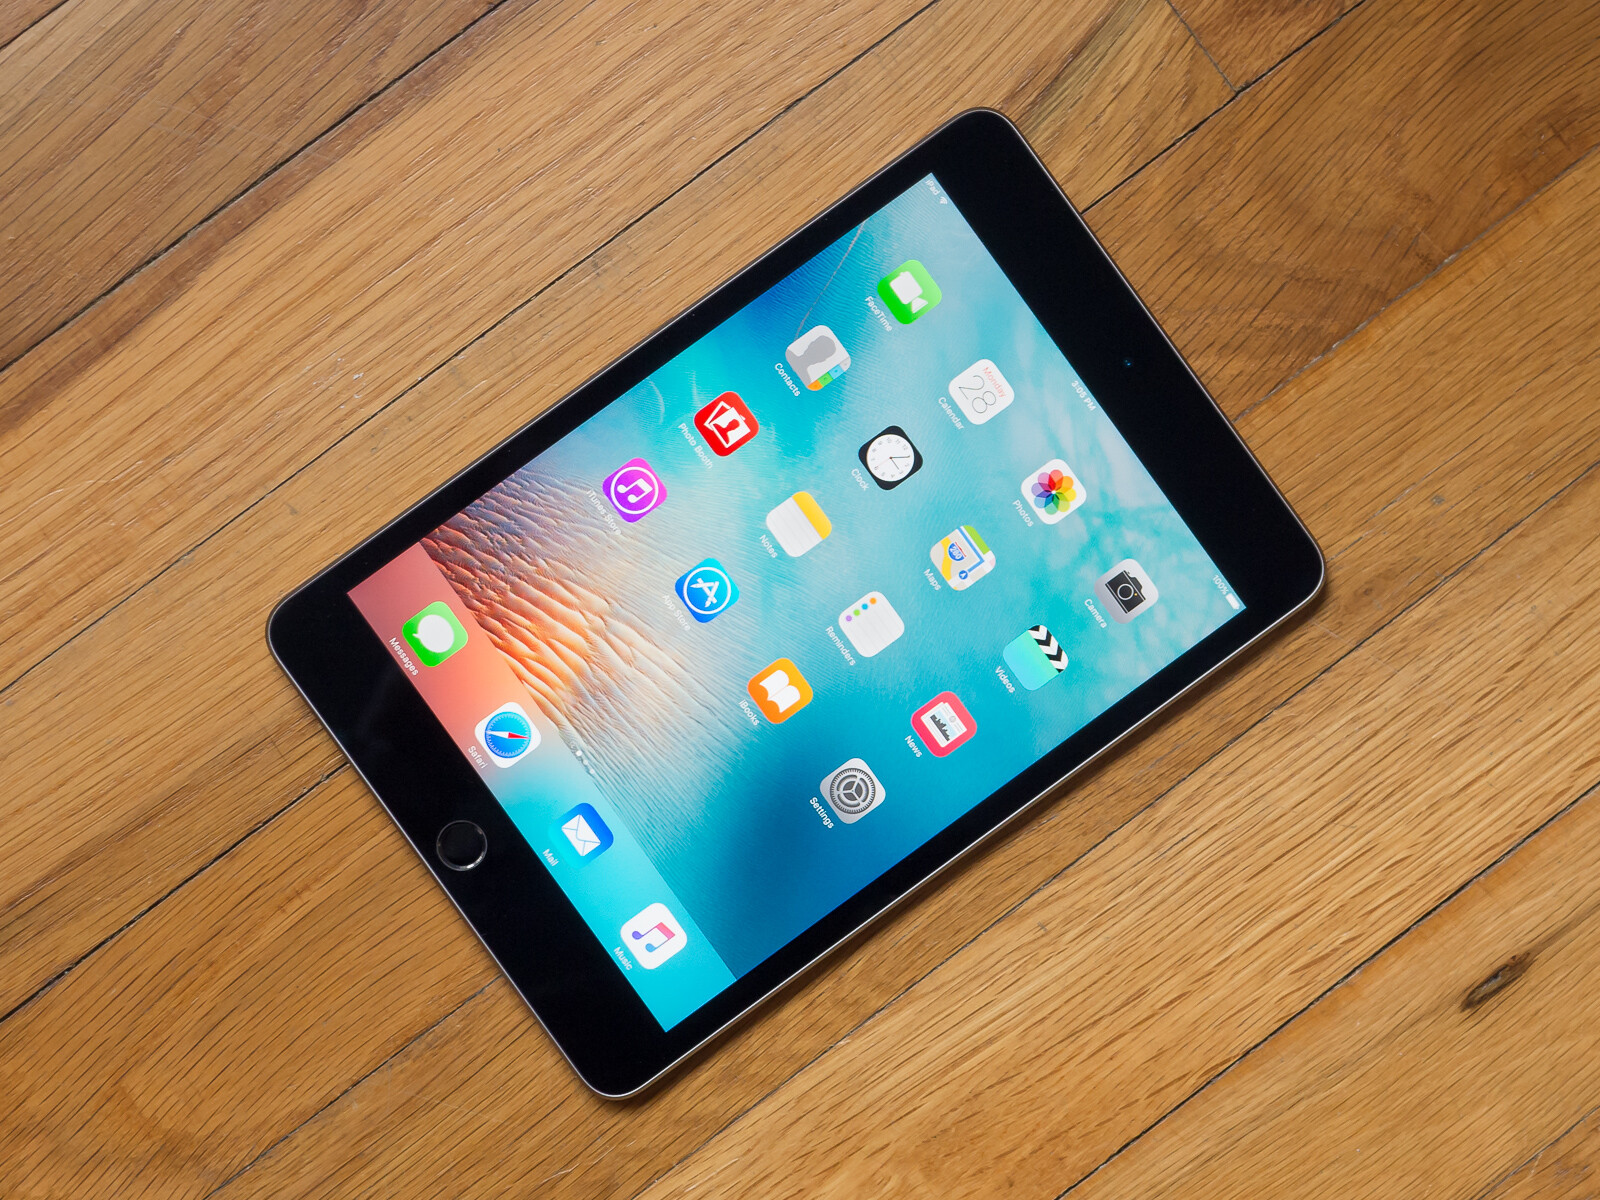 apple ipad mini 4 photos